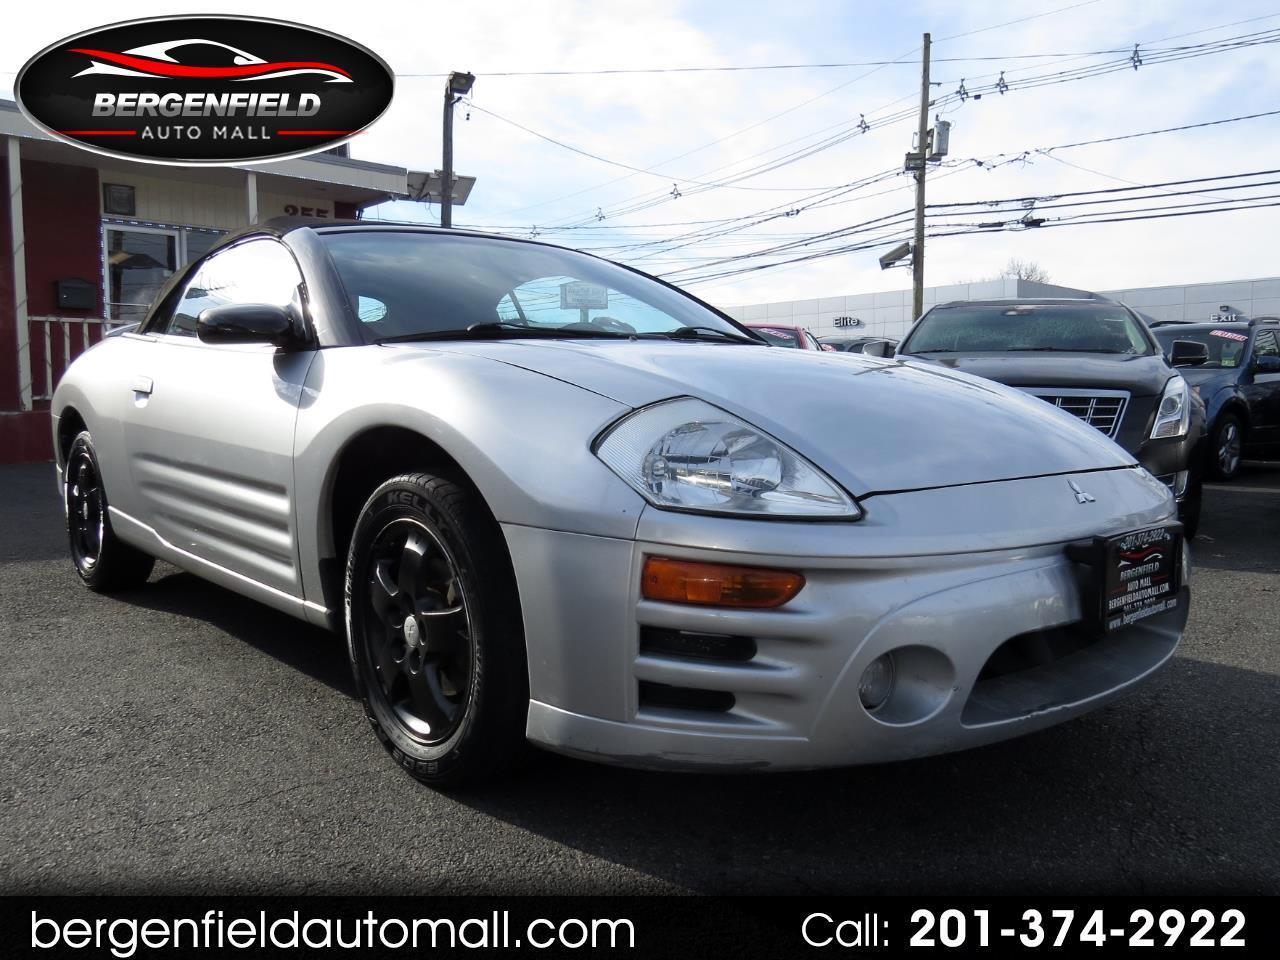 2004 Mitsubishi Eclipse GS Spyder